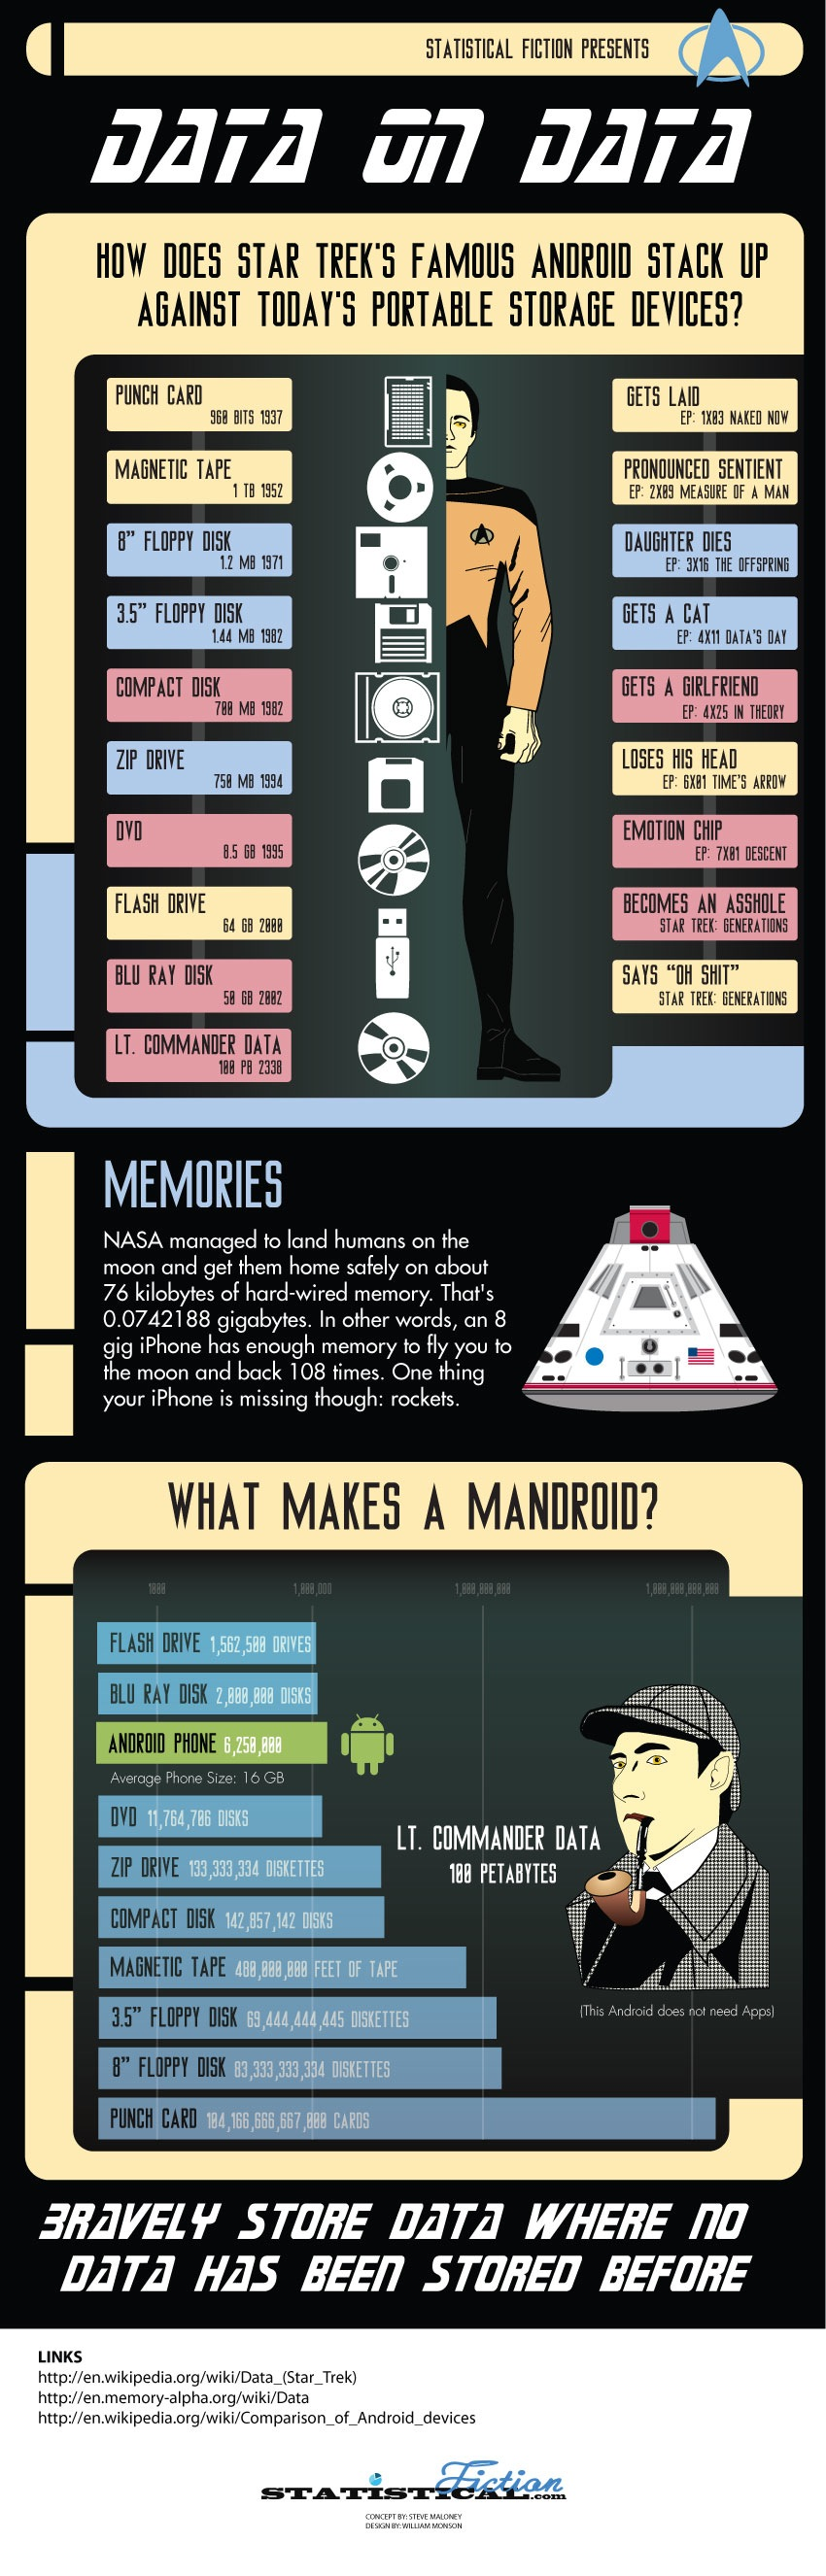 Data On Data: Star Trek's Andriod vs. Today's Portable Storage Devices